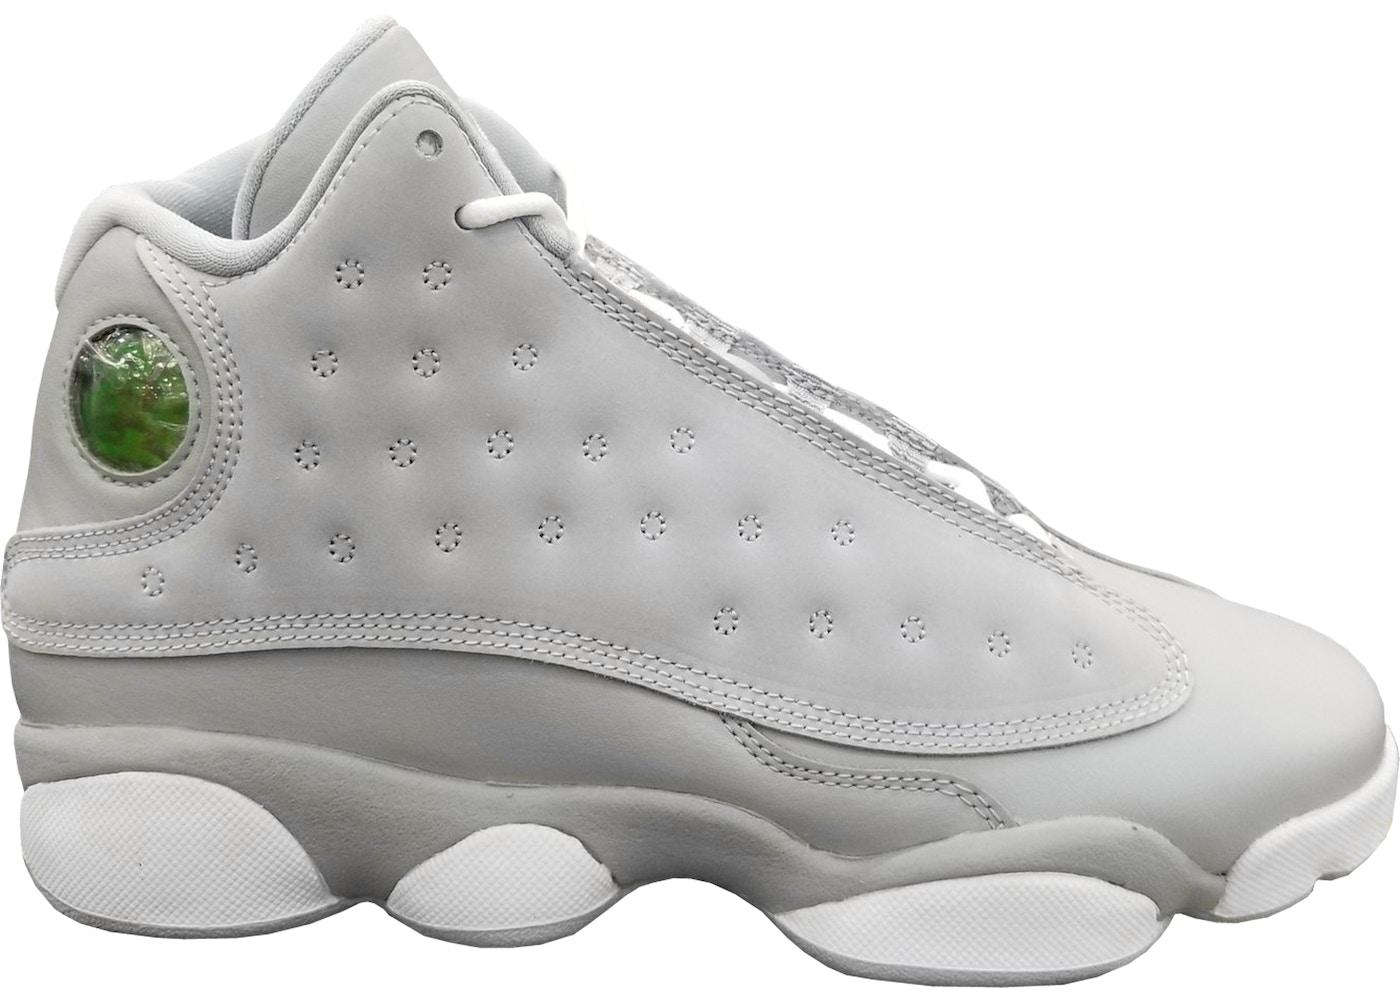 37eec5056713a Buy Air Jordan 13 Shoes   Deadstock Sneakers